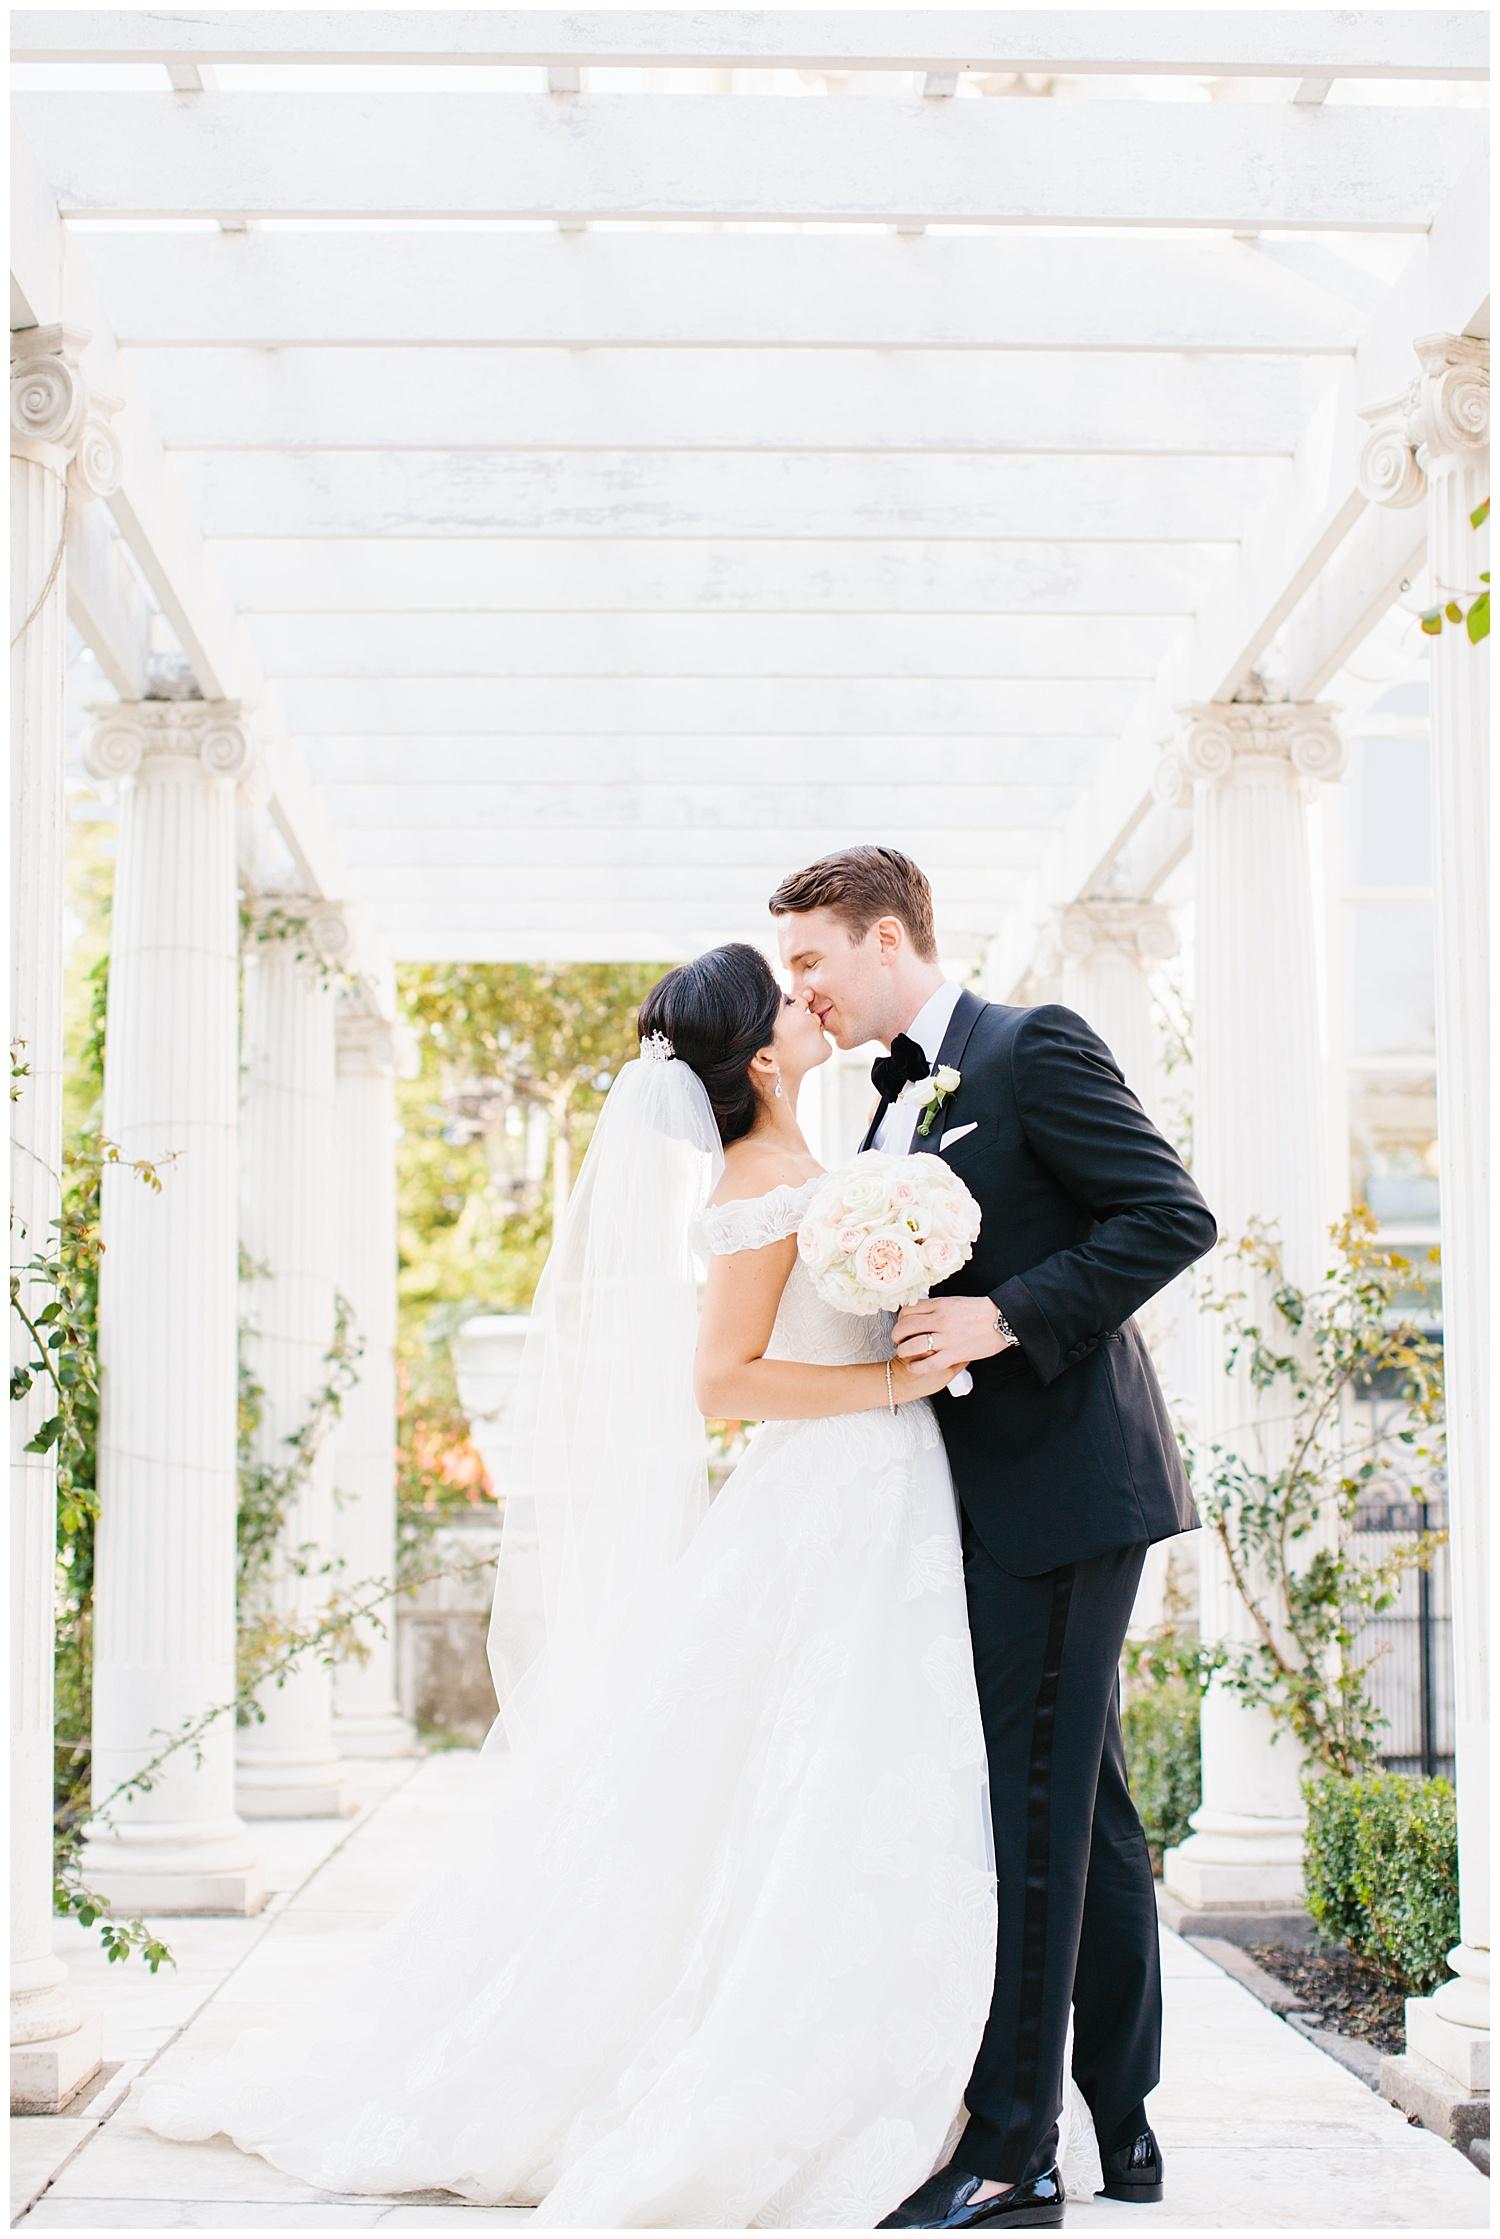 Stephen_Nathalie_Rosecliff_Mansion_Wedding_010.jpeg